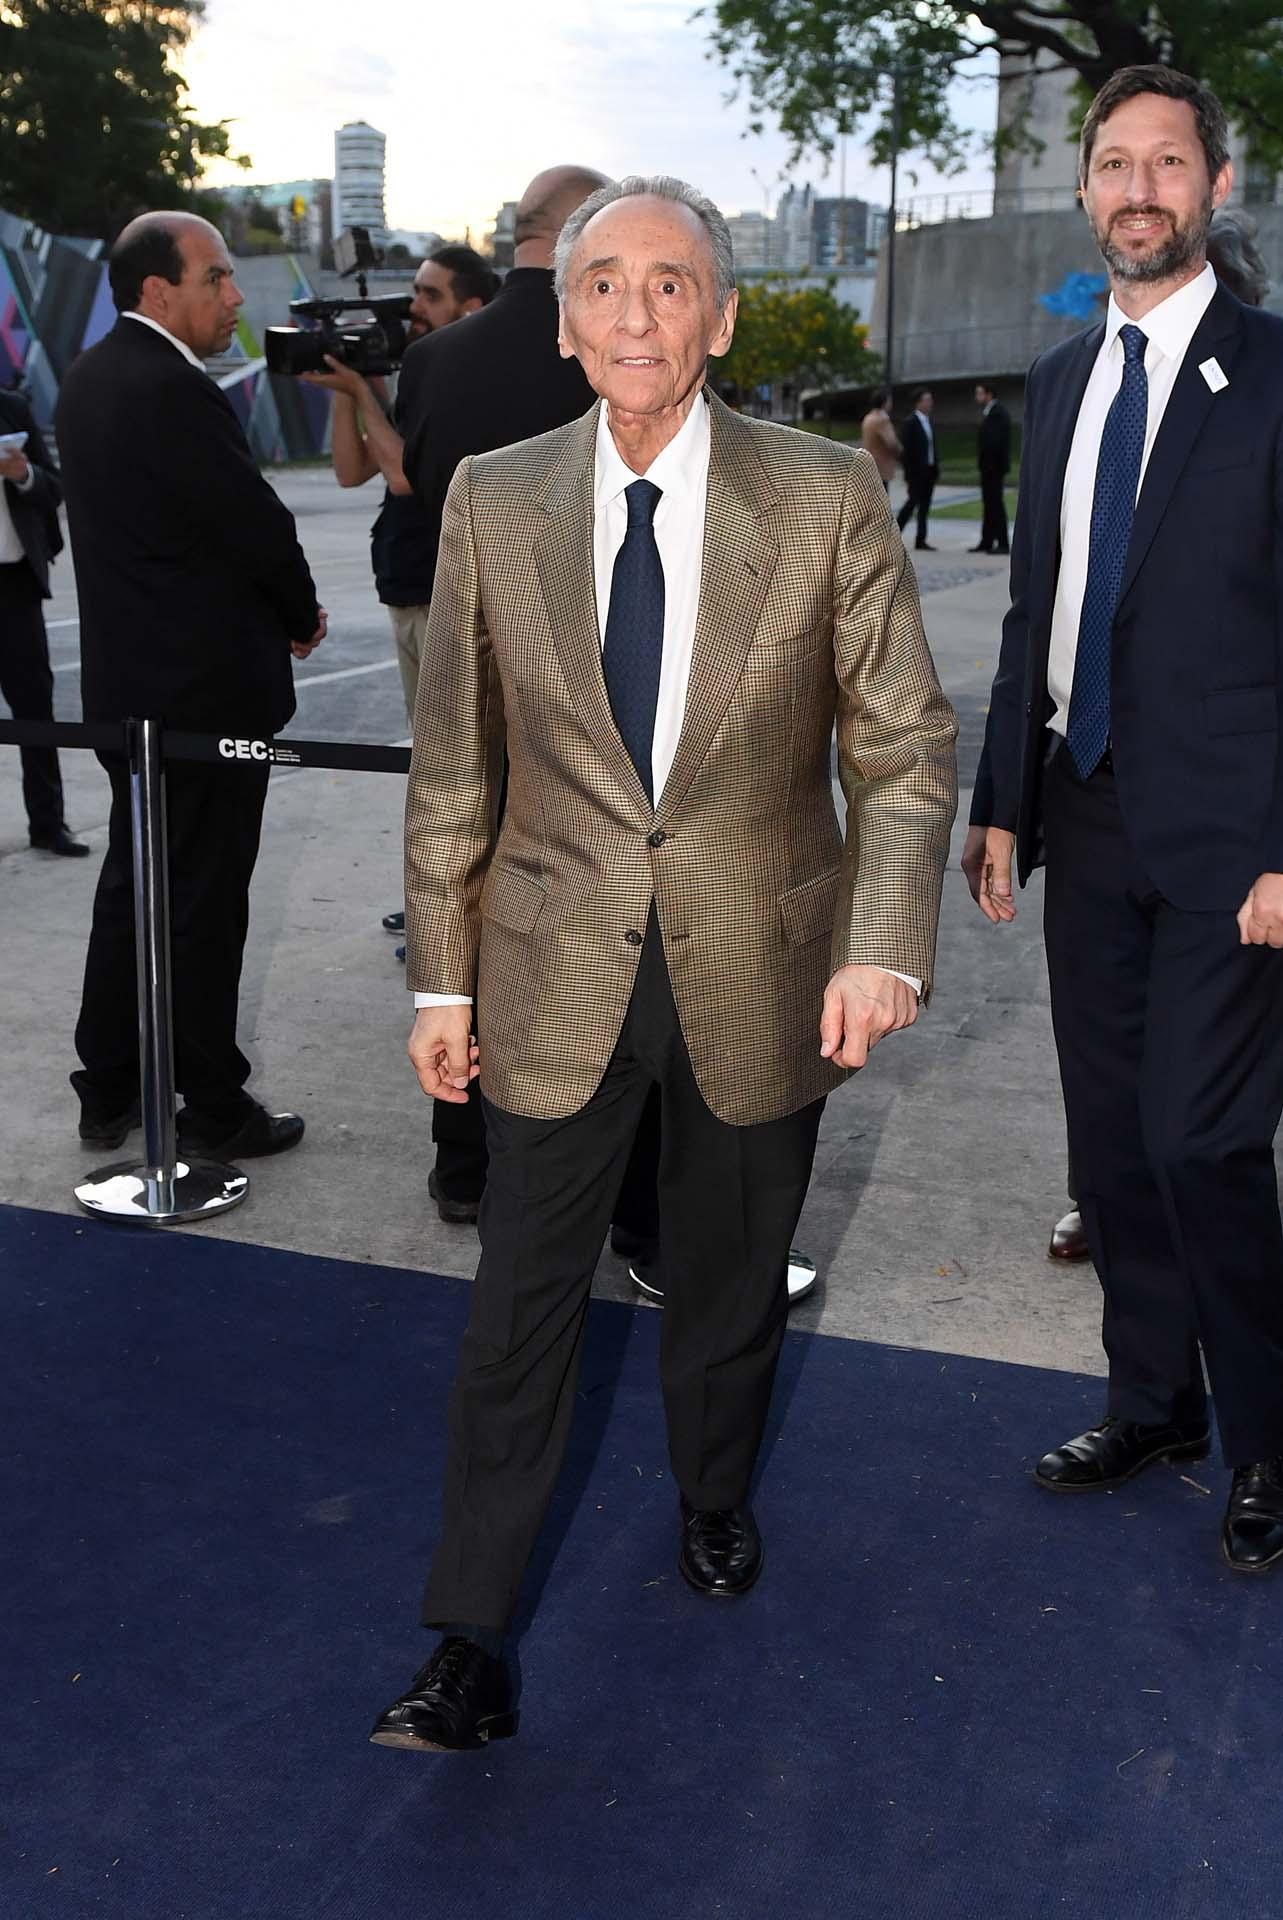 Héctor Magnetto, CEO del Grupo Clarín